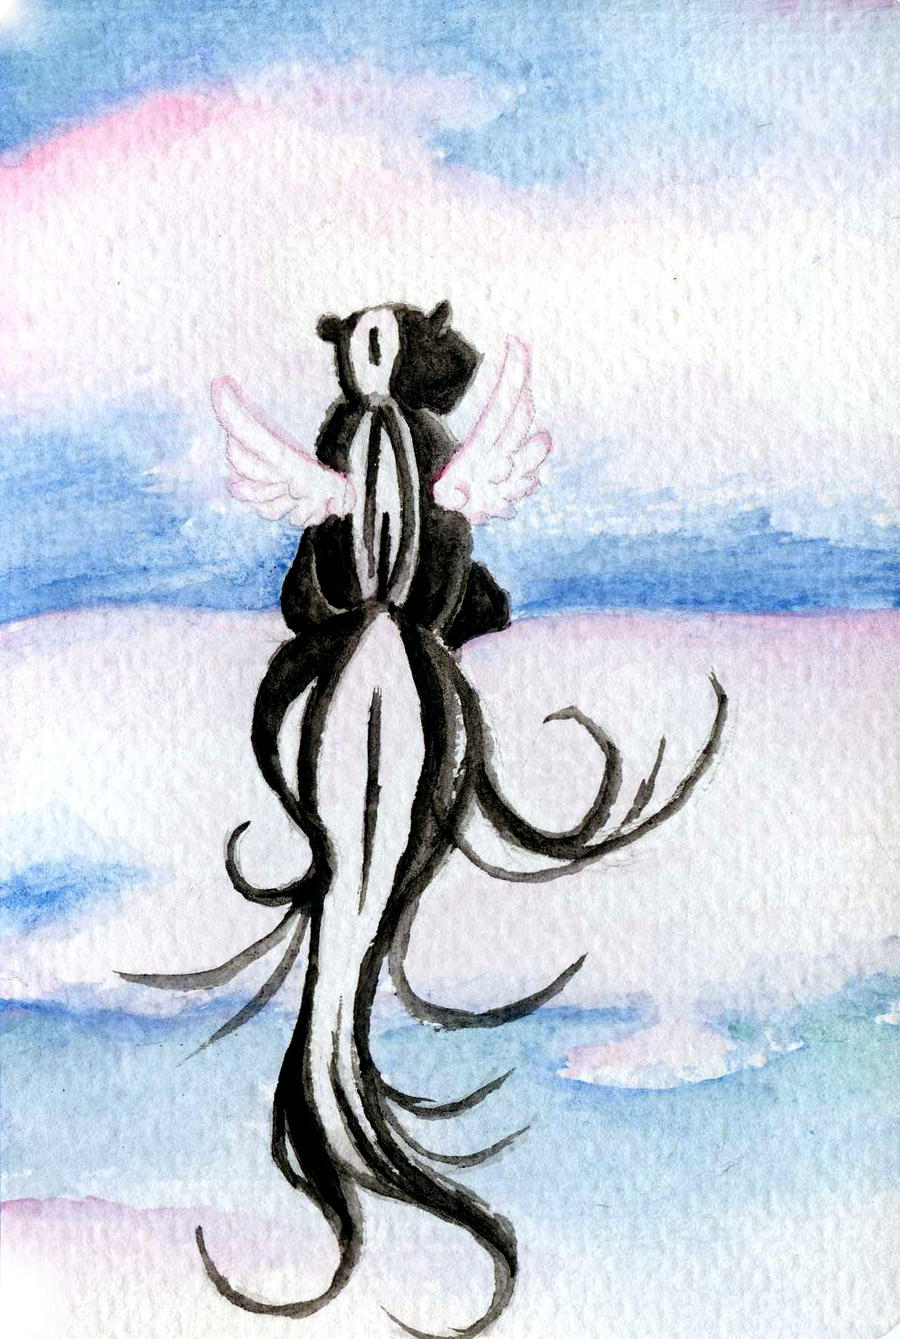 a furriest dream by NanakoHarrison